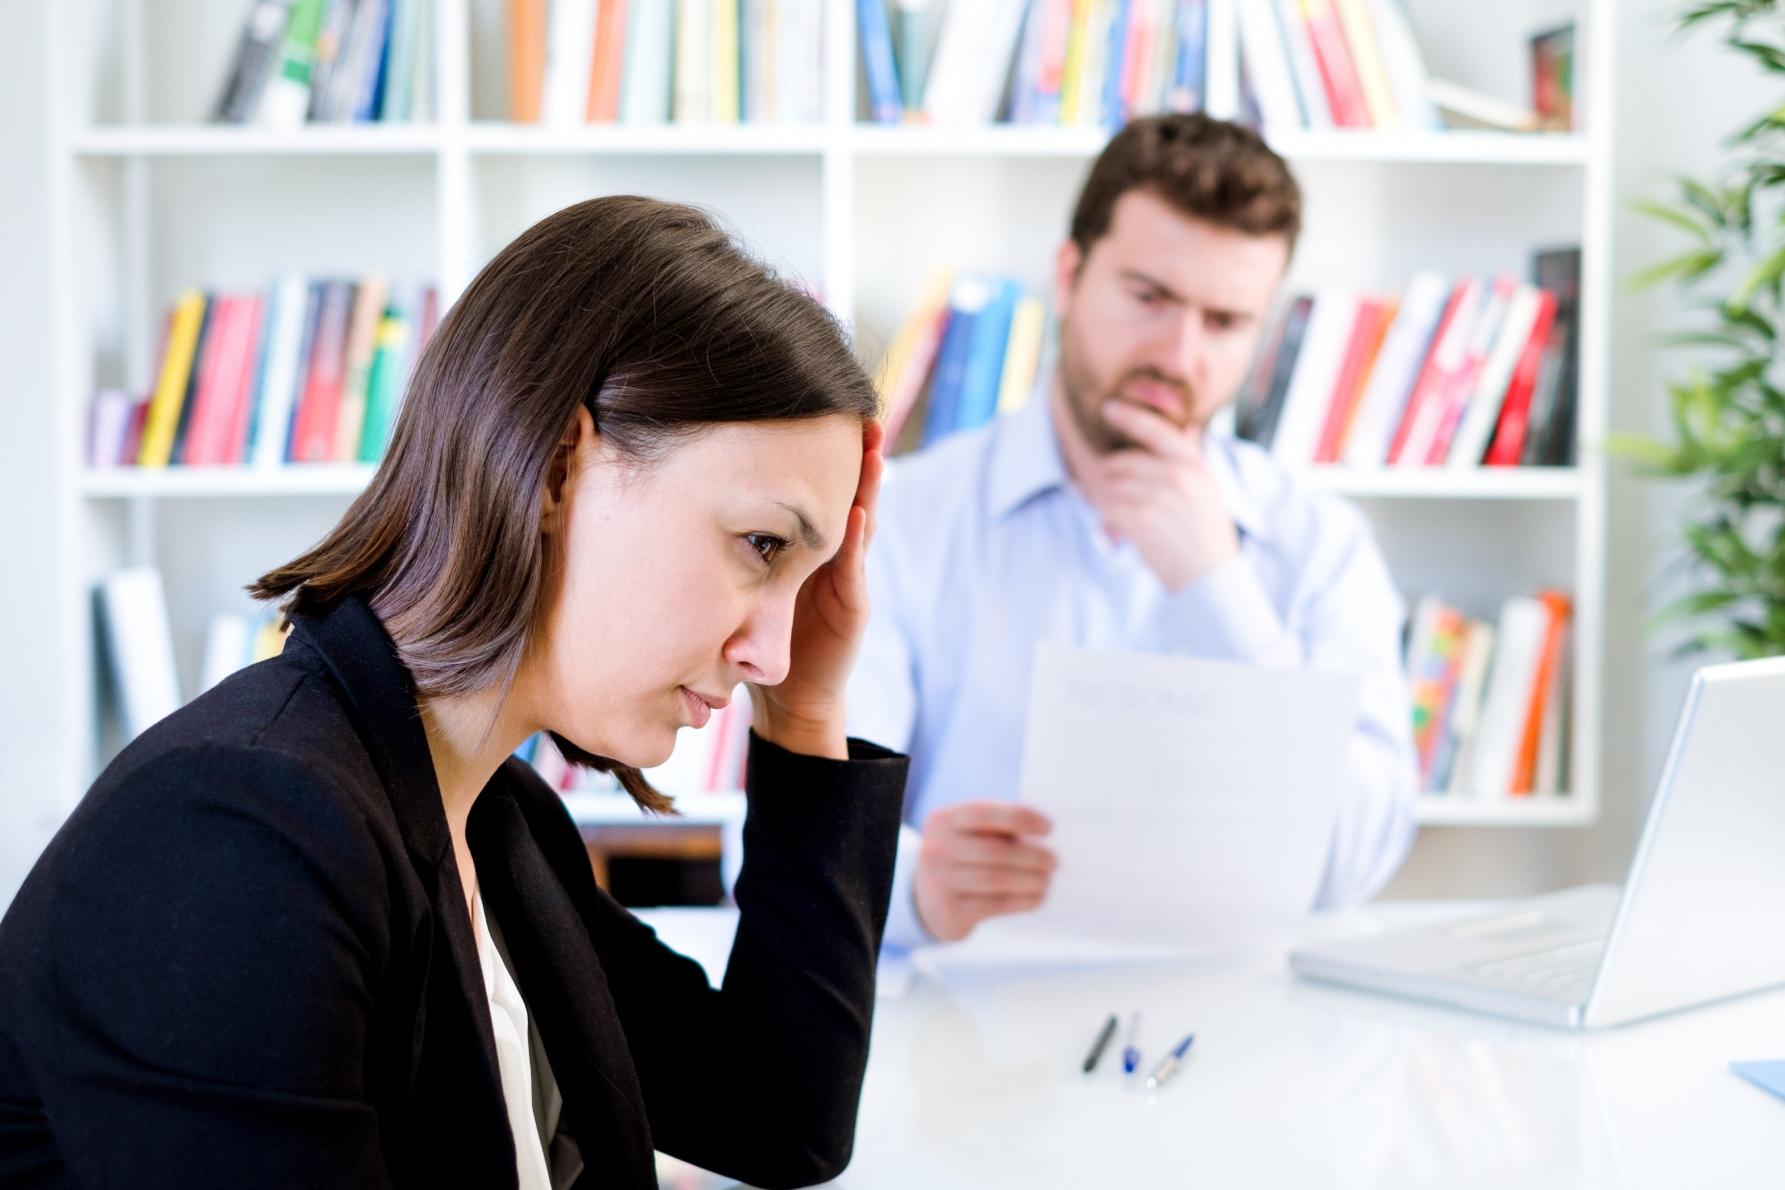 Entrevista de emprego: saiba identificar perguntas inadequadas